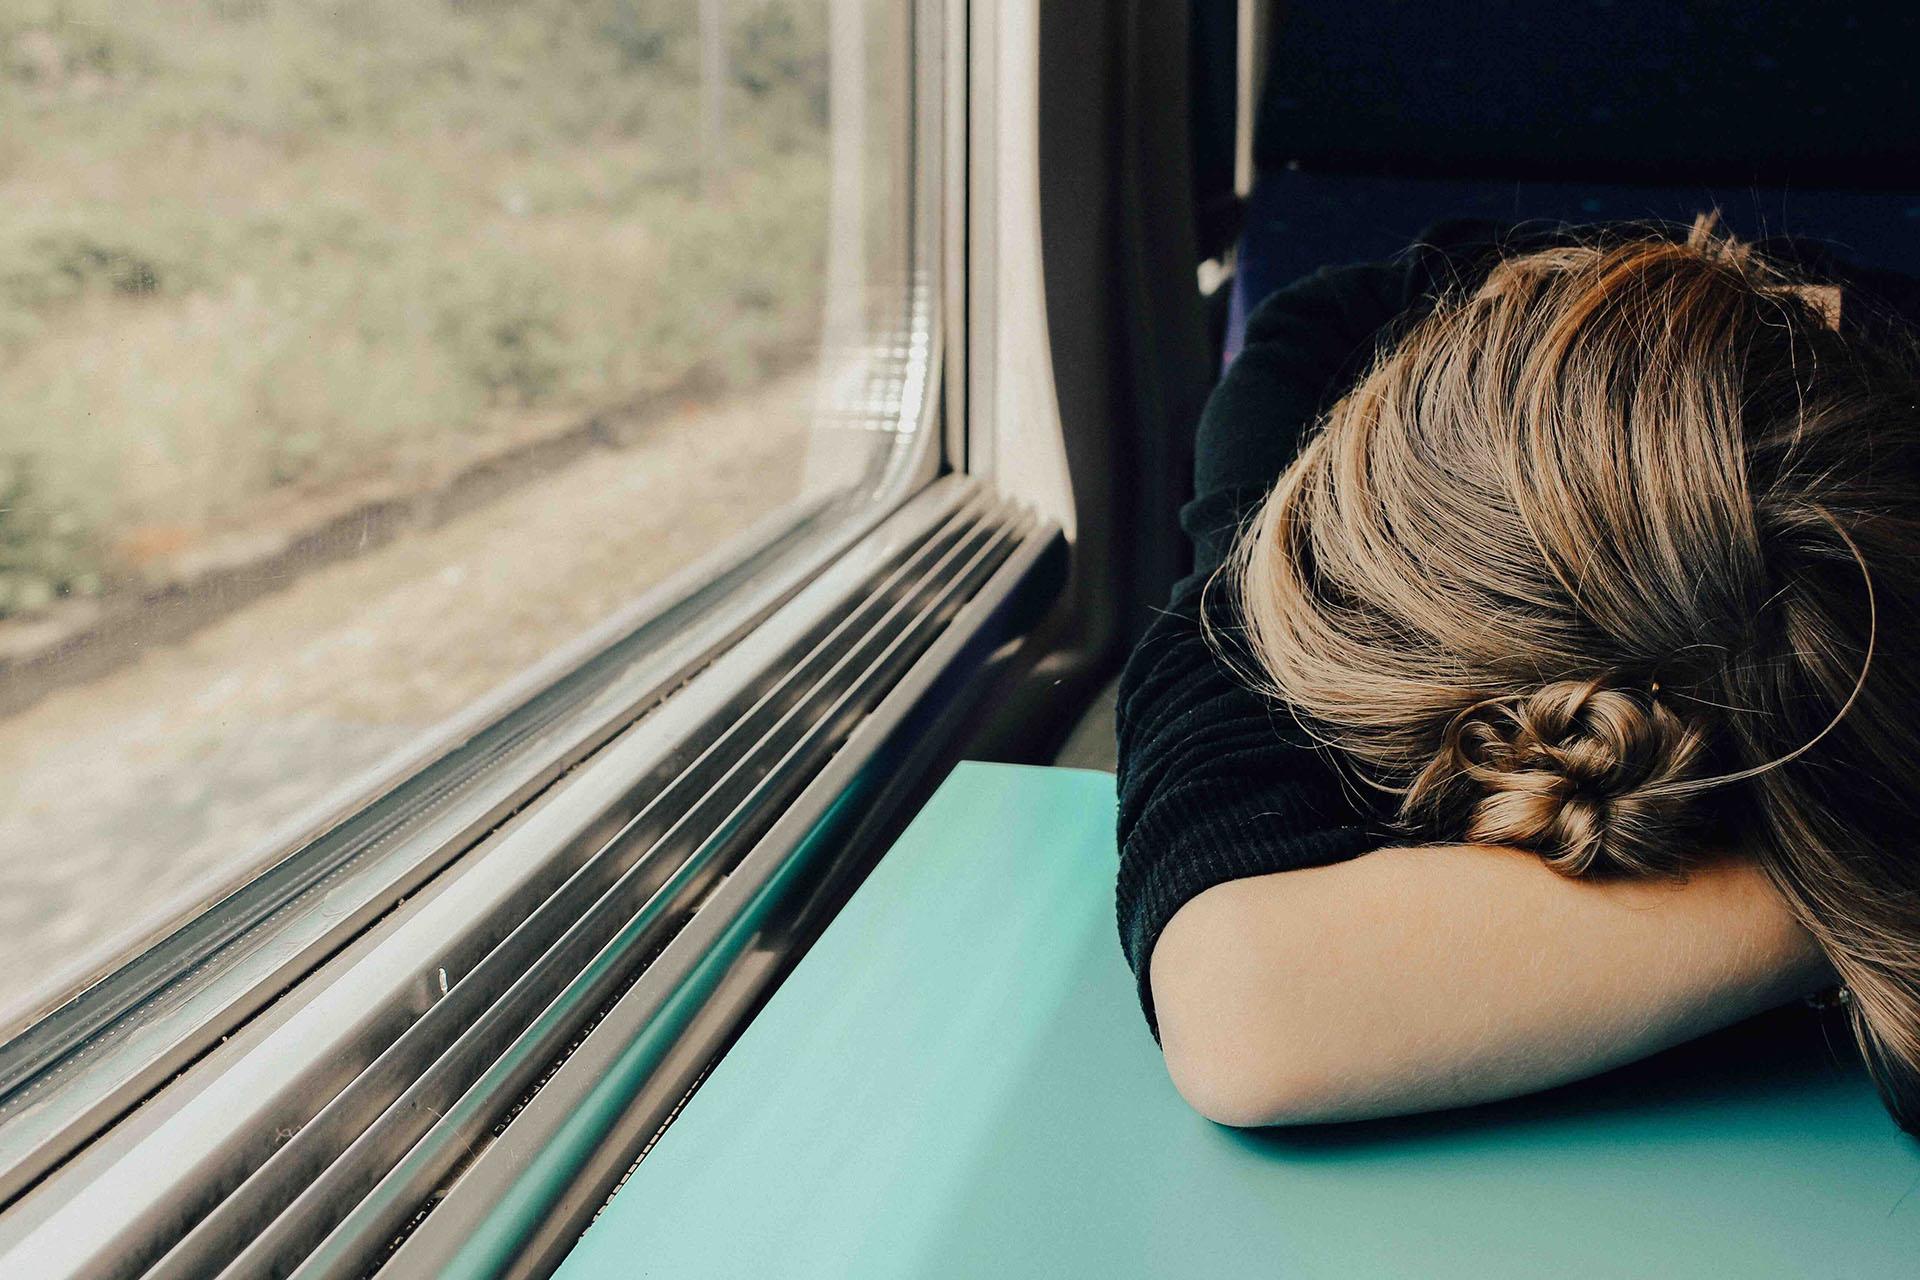 Daytime Fatigue Sleep Apnea 01 Achieve Health Ryan Nolen DO1